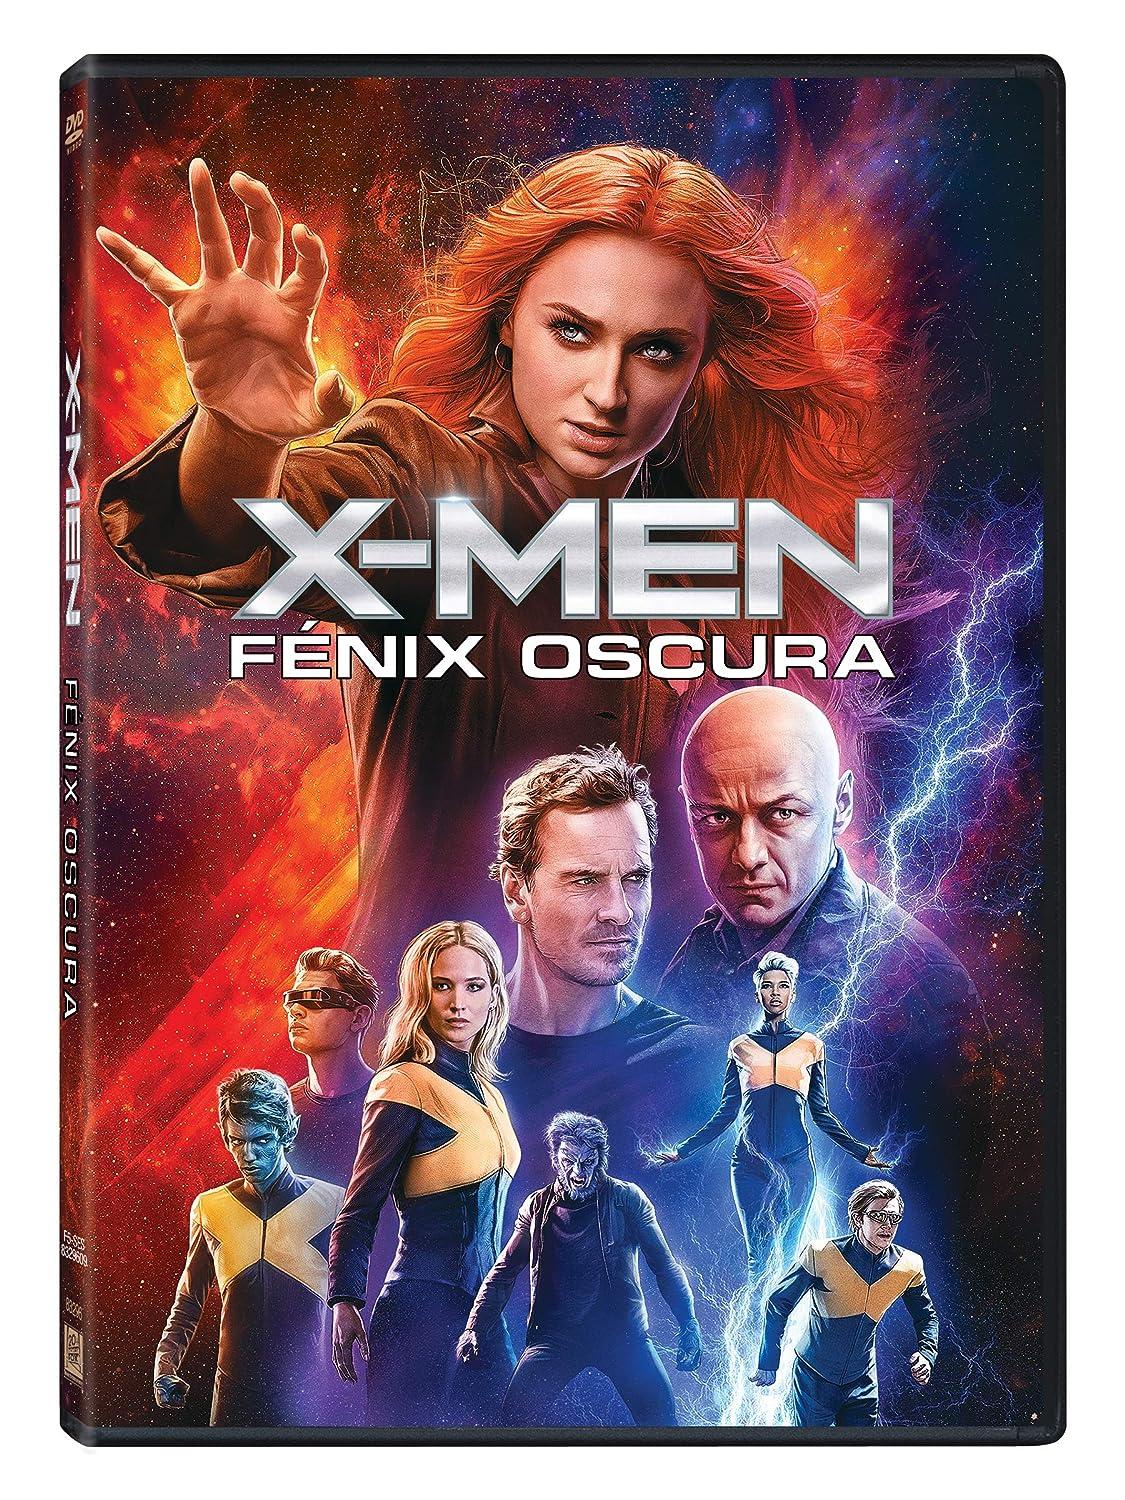 X-Men: Fénix Oscura [DVD]: Amazon.es: James Mcavoy, Jennifer Lawrence,  Michael Fassbender, Sophie Turner, Simon Kinberg, James Mcavoy, Jennifer  Lawrence: Cine y Series TV